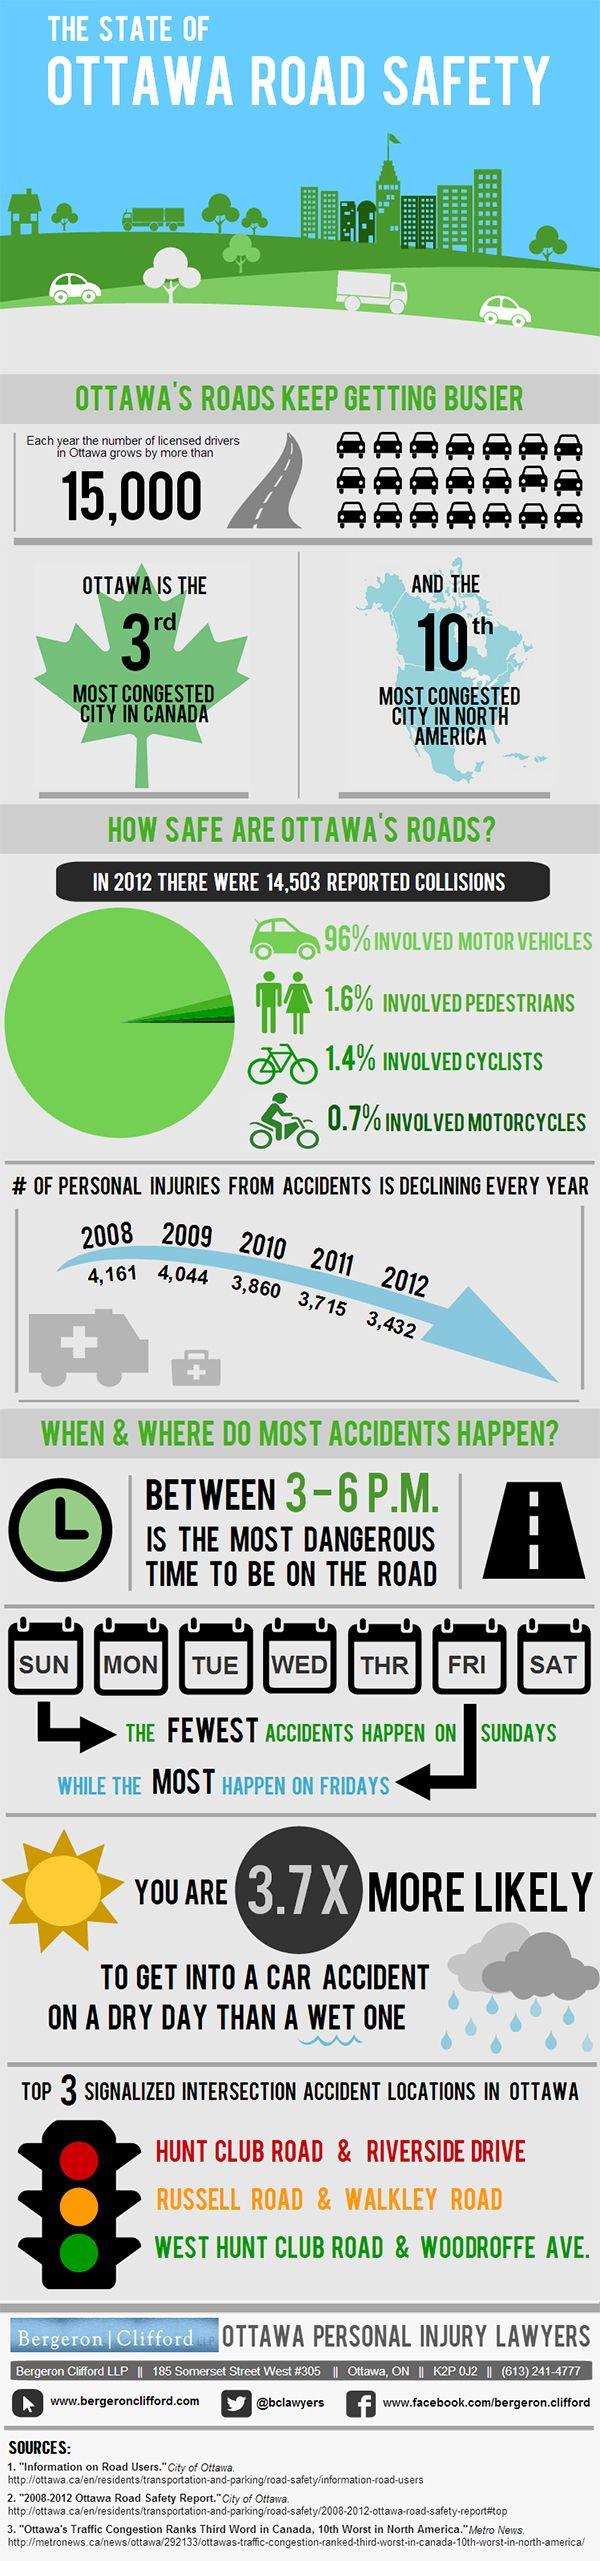 The State of Ottawa Road Safety #ottawa #roadsafety